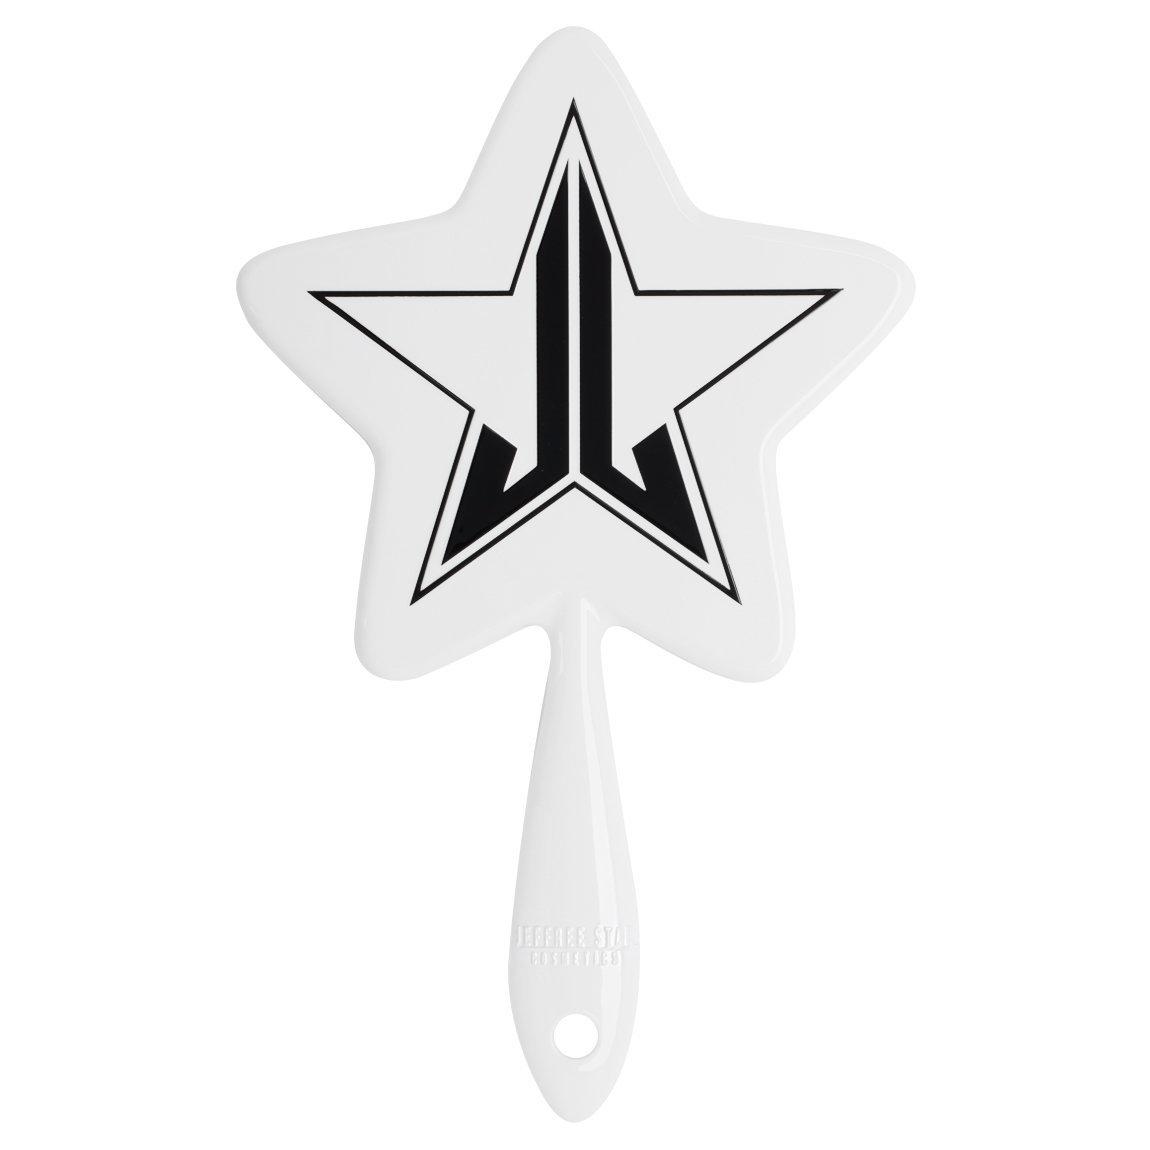 Jeffree Star Cosmetics Star Mirror White Halloween